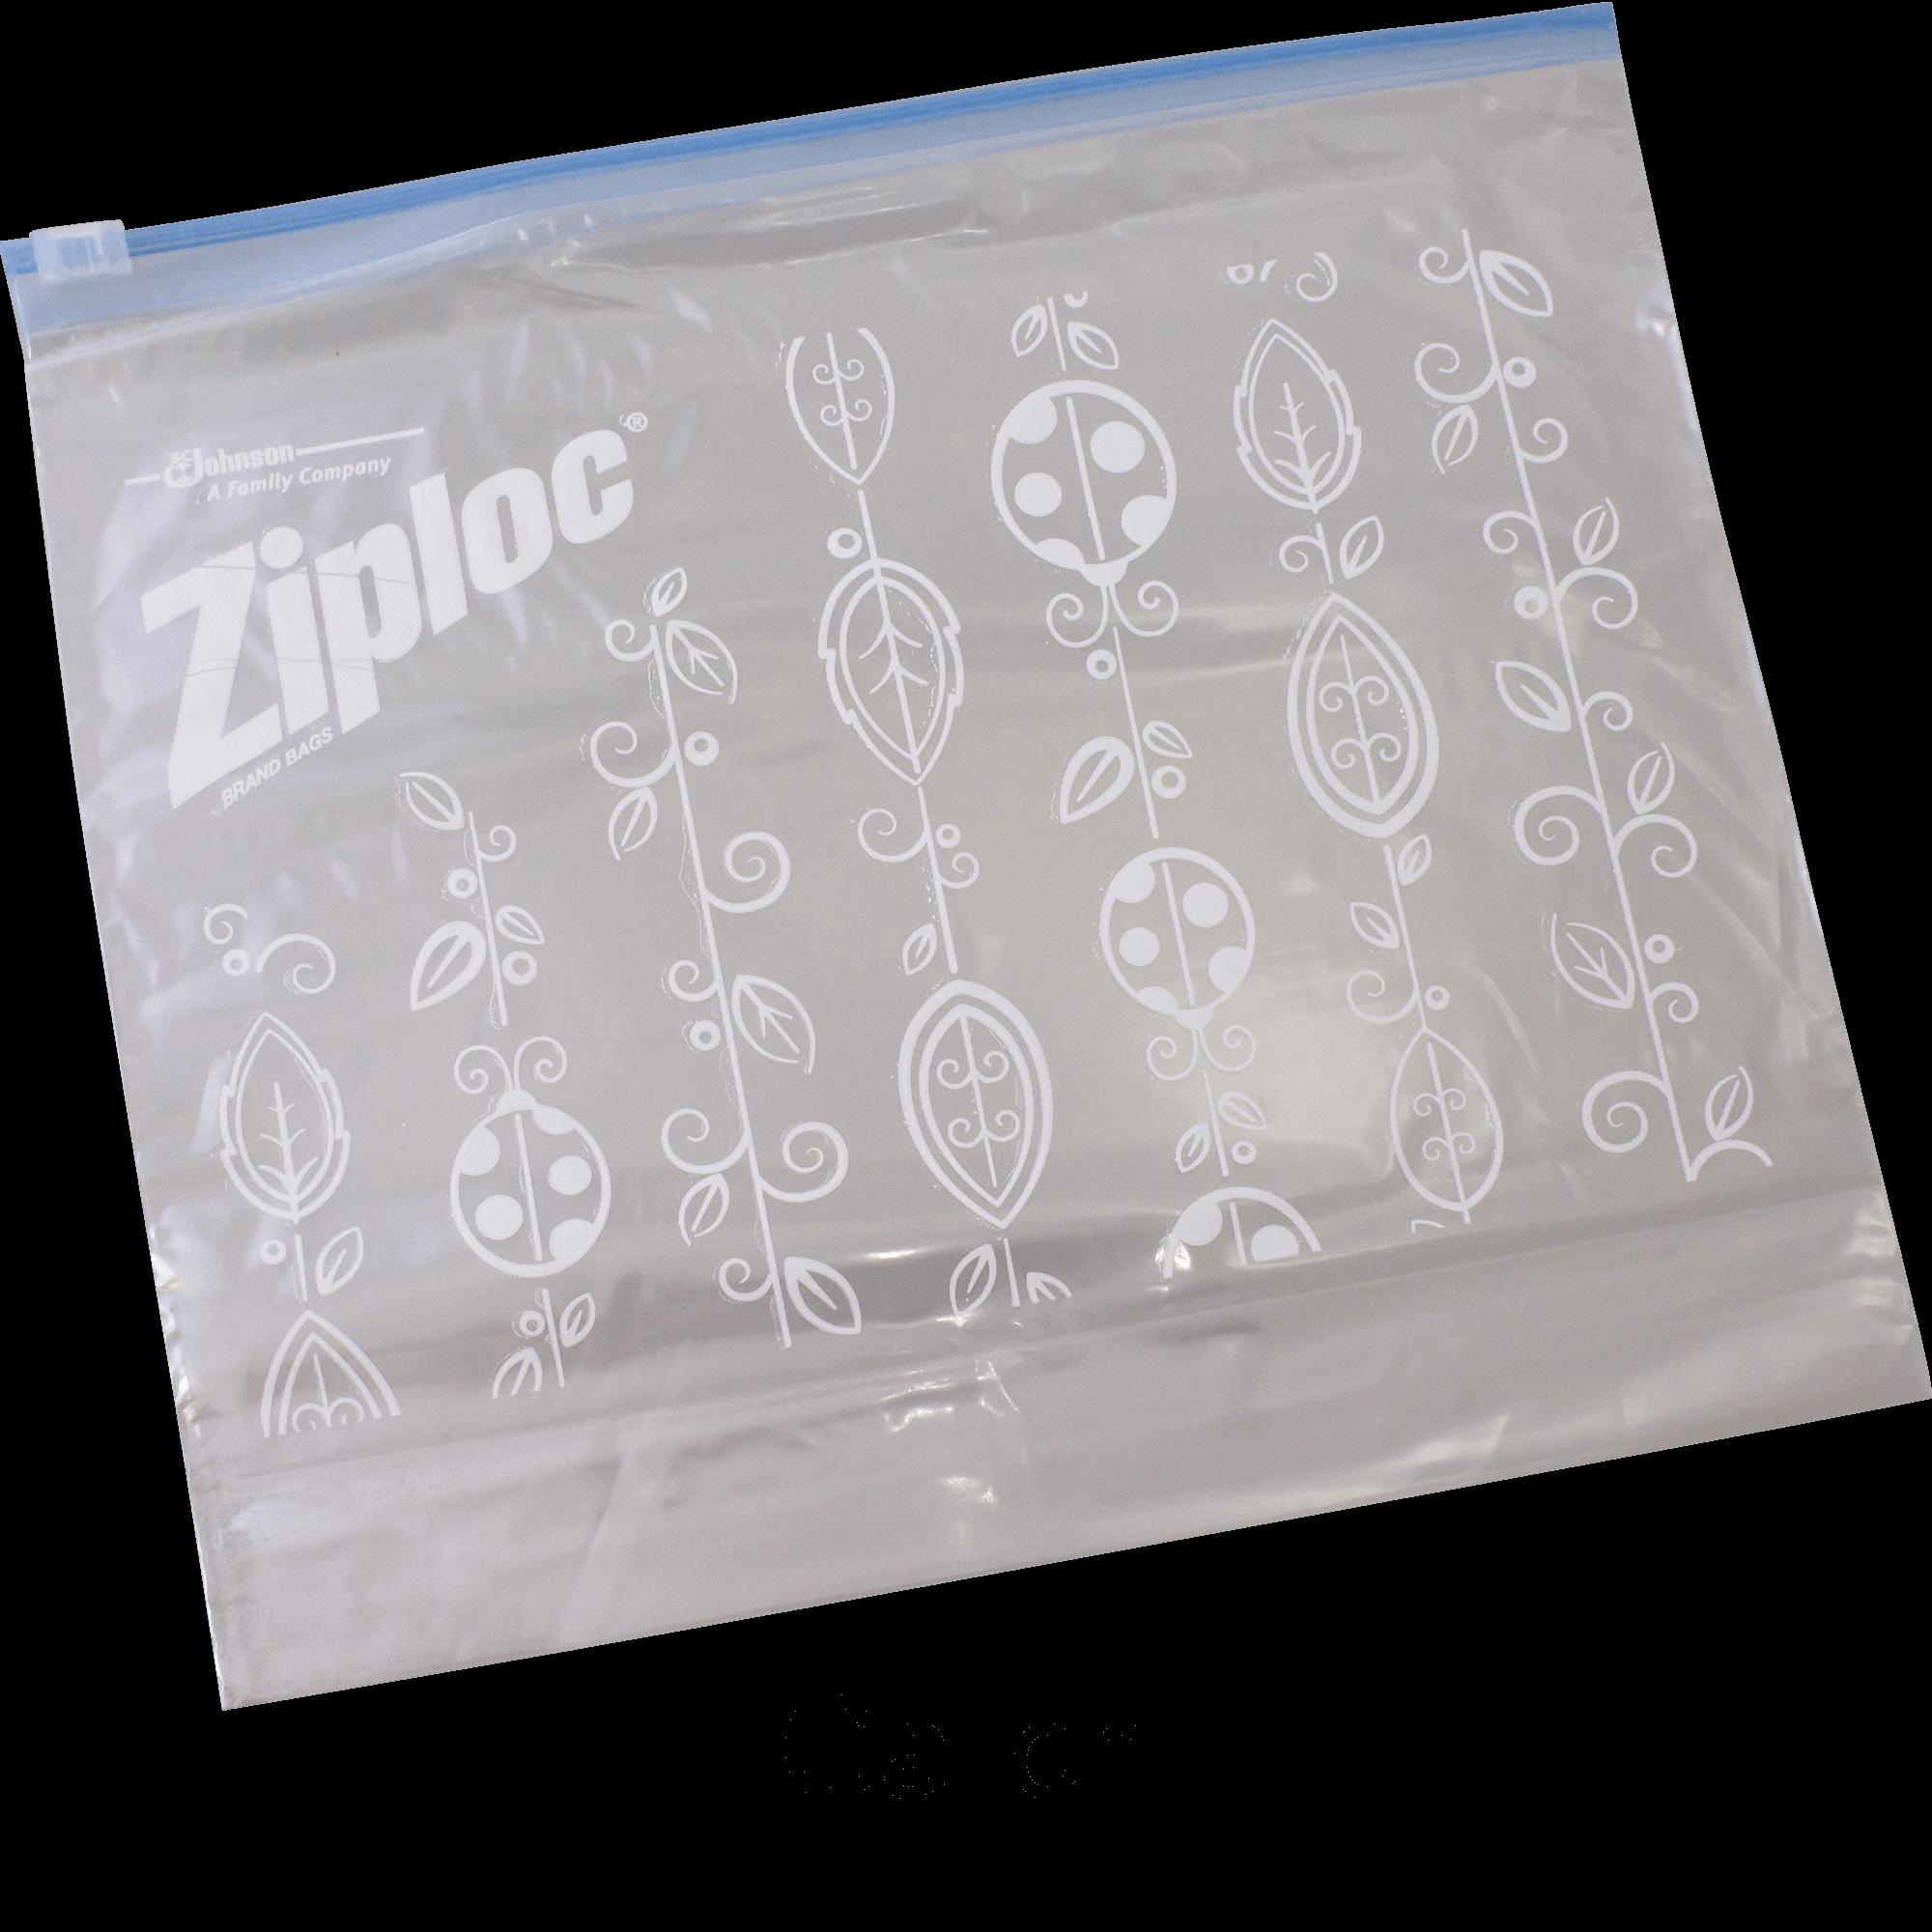 Ziploc 156-Count Variety Pack